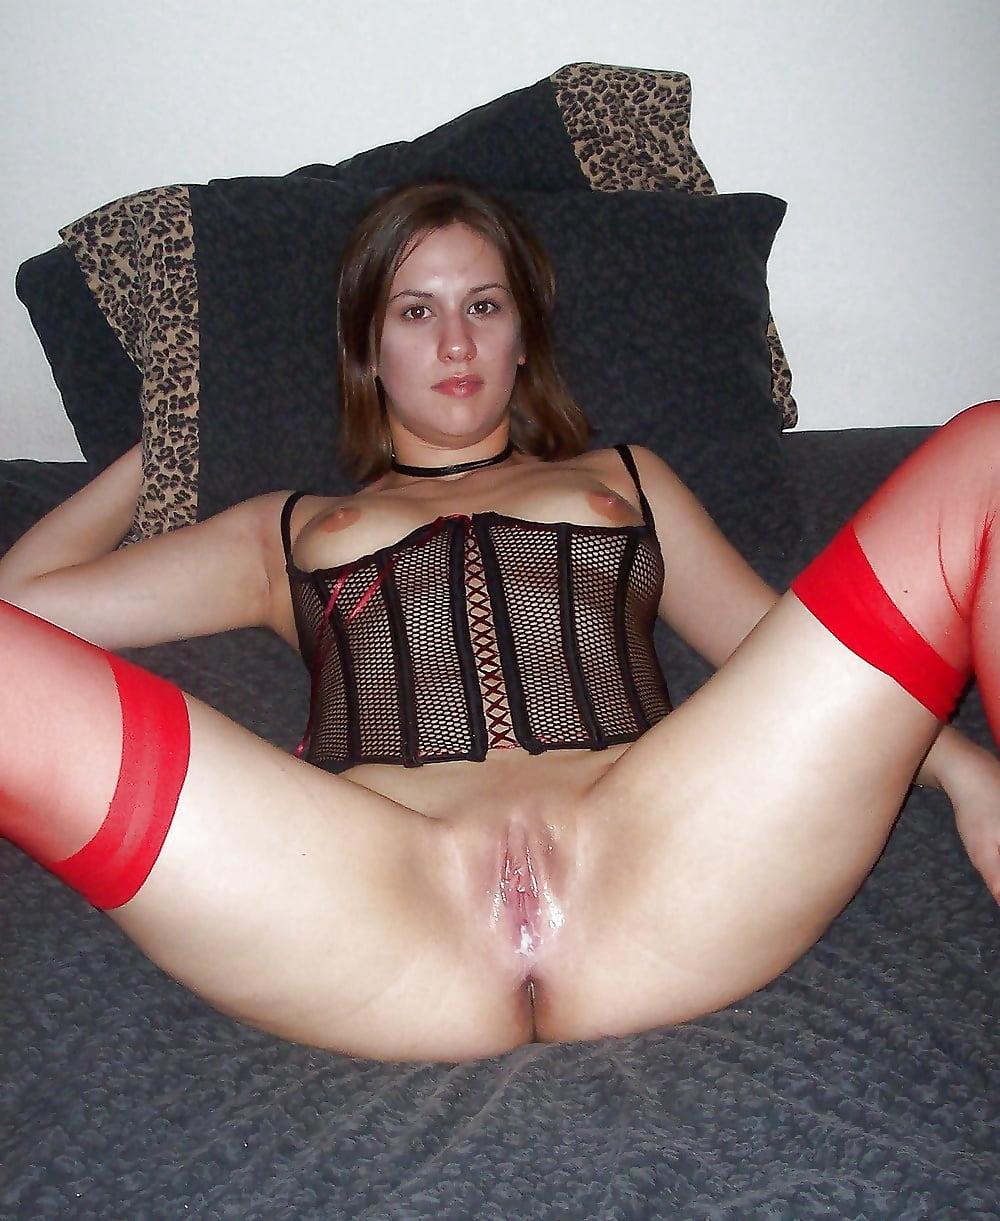 Sexy Young Teen Slut Pussy Selfie